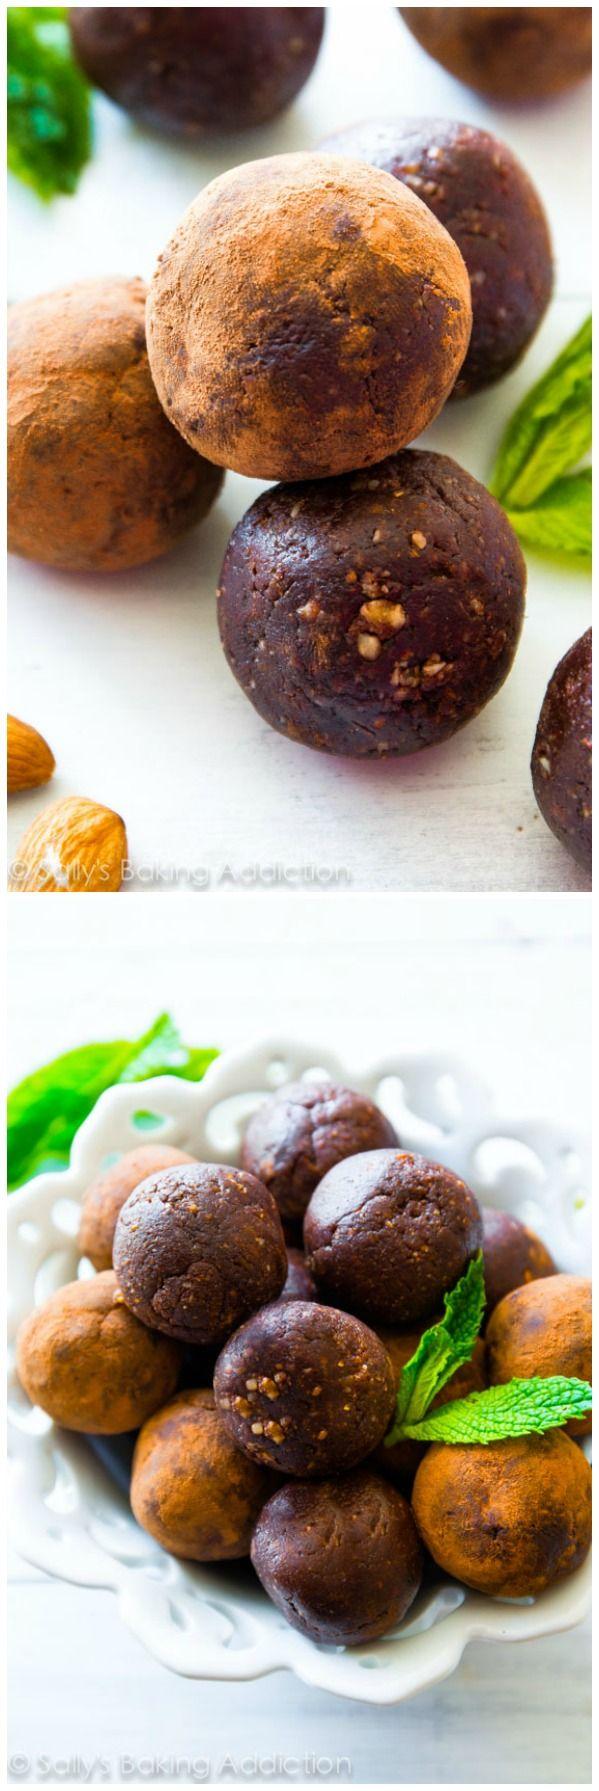 6 ingredient Mint Chocolate Energy Bites - gluten free, super fudgy, naturally sweetened, and no sugar crash!